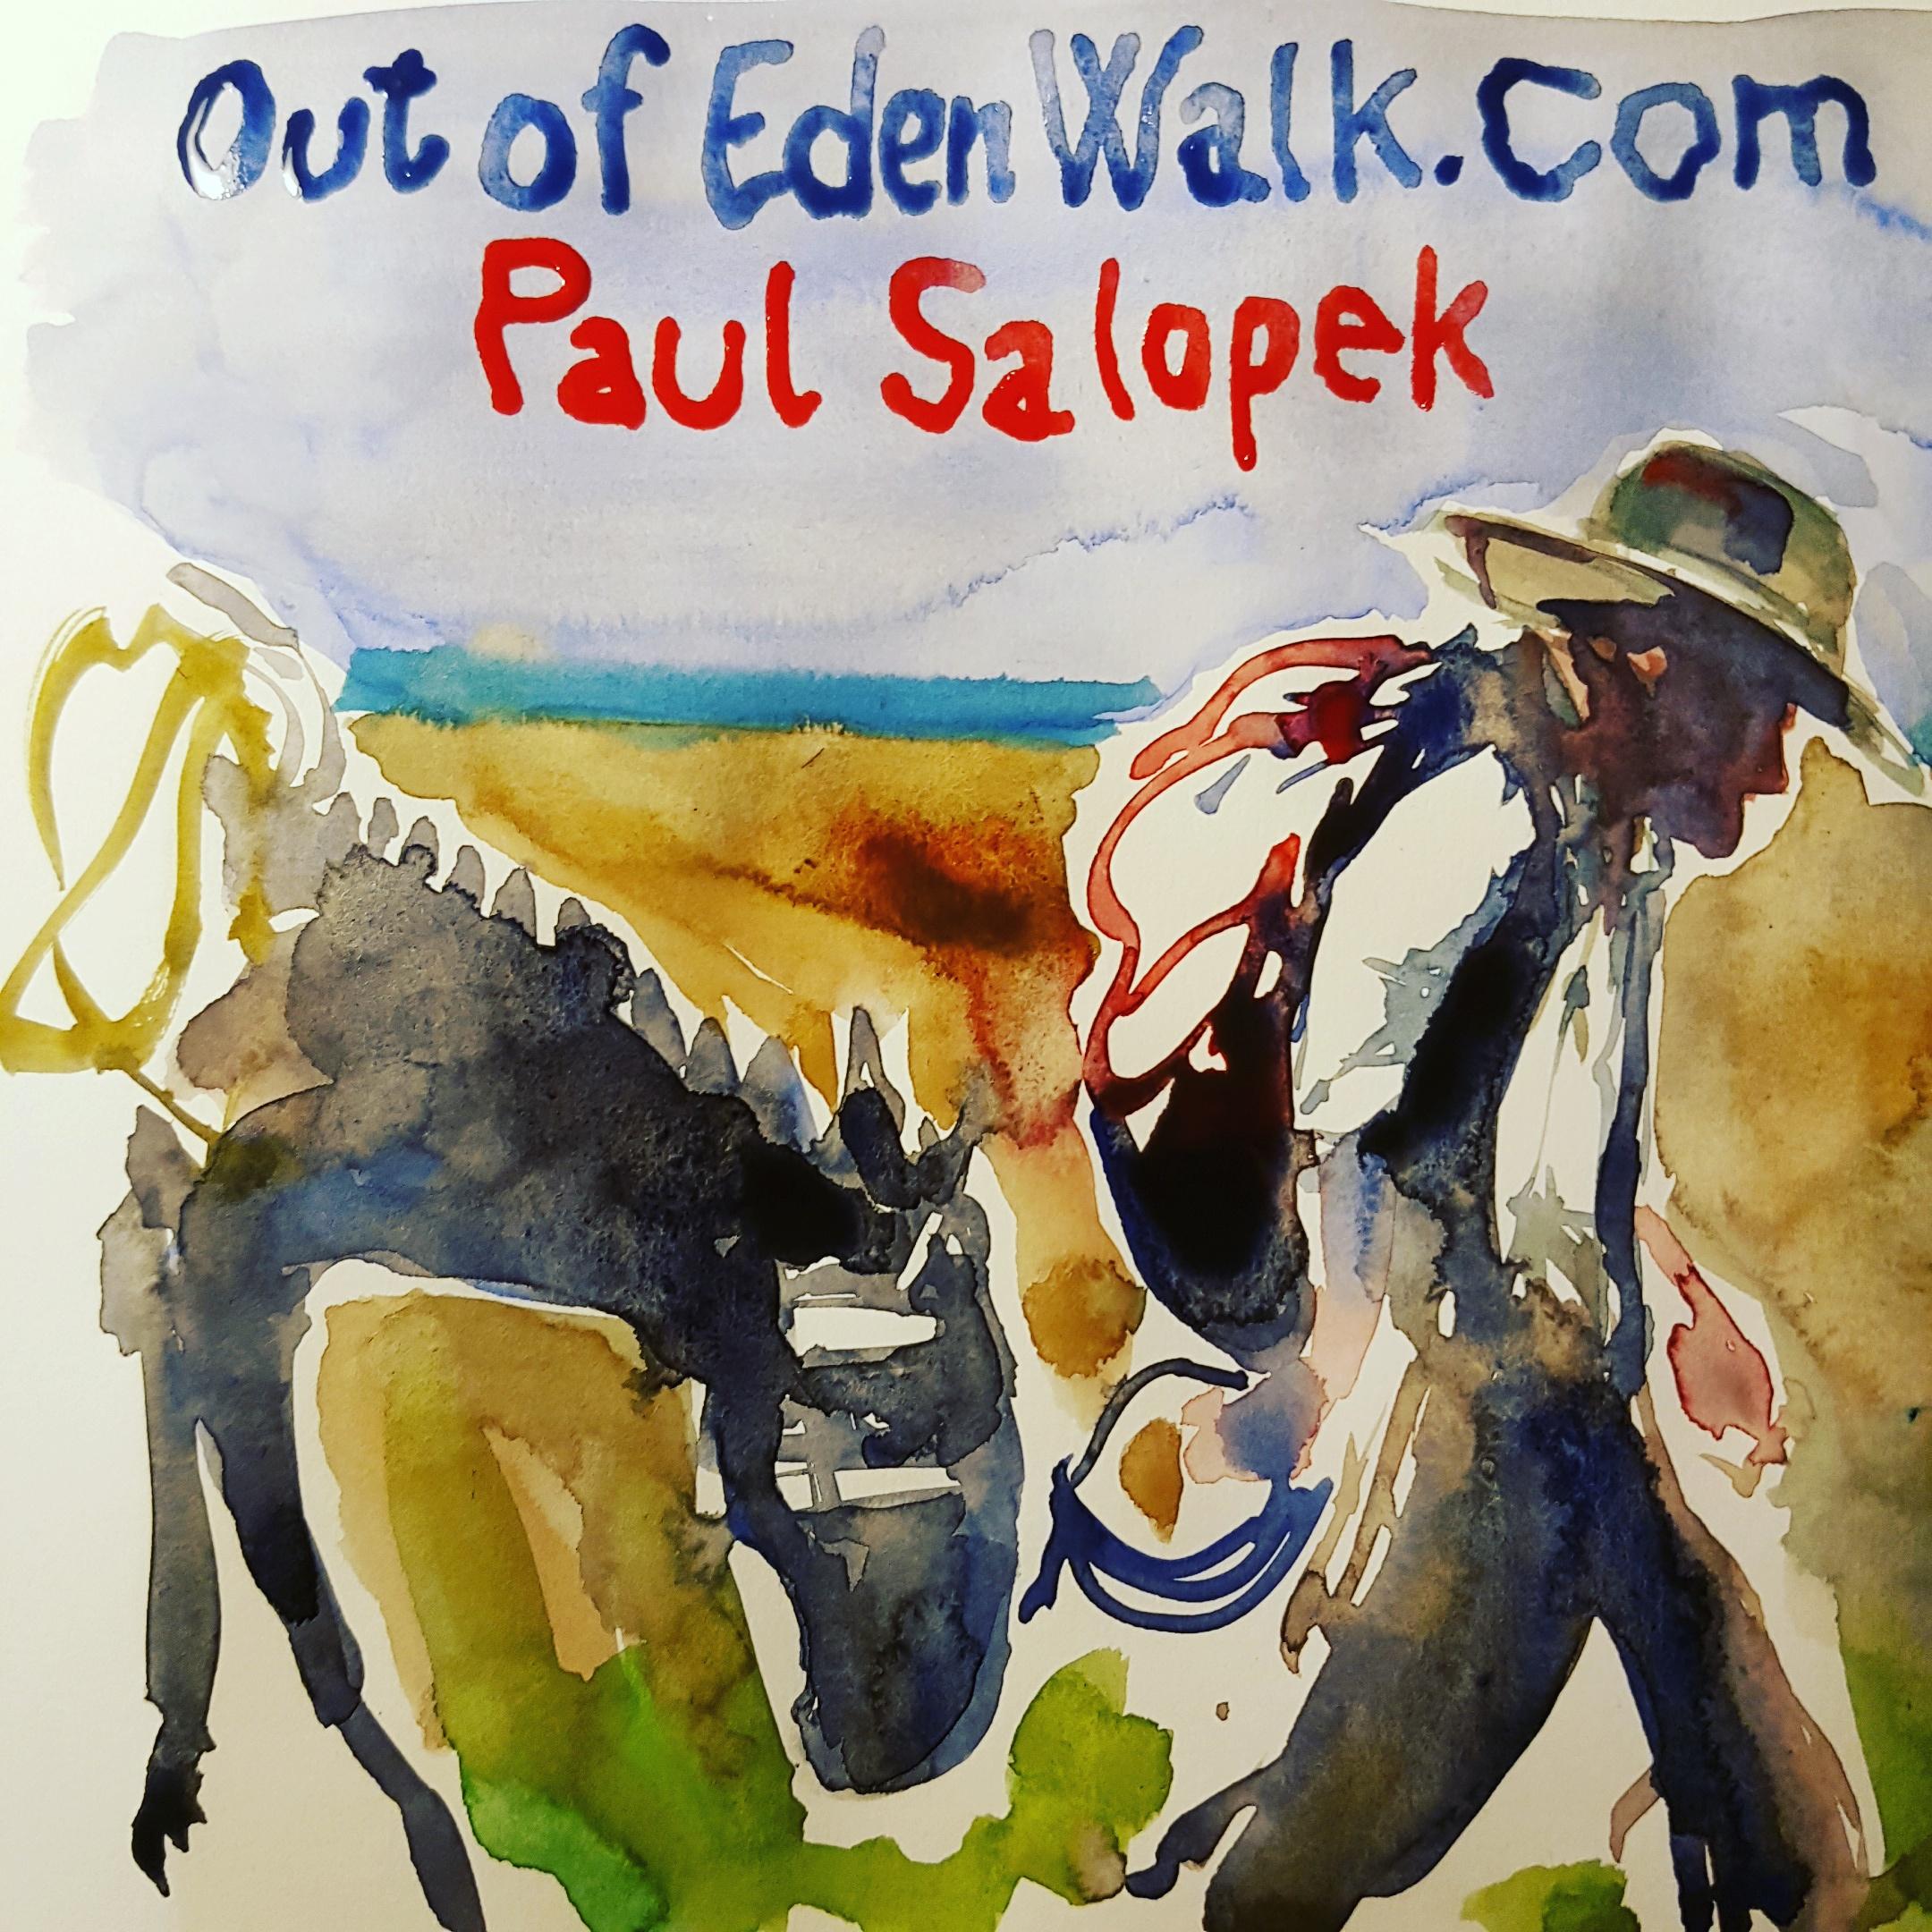 Watercolor of long distance walker and writer Paul Salopek